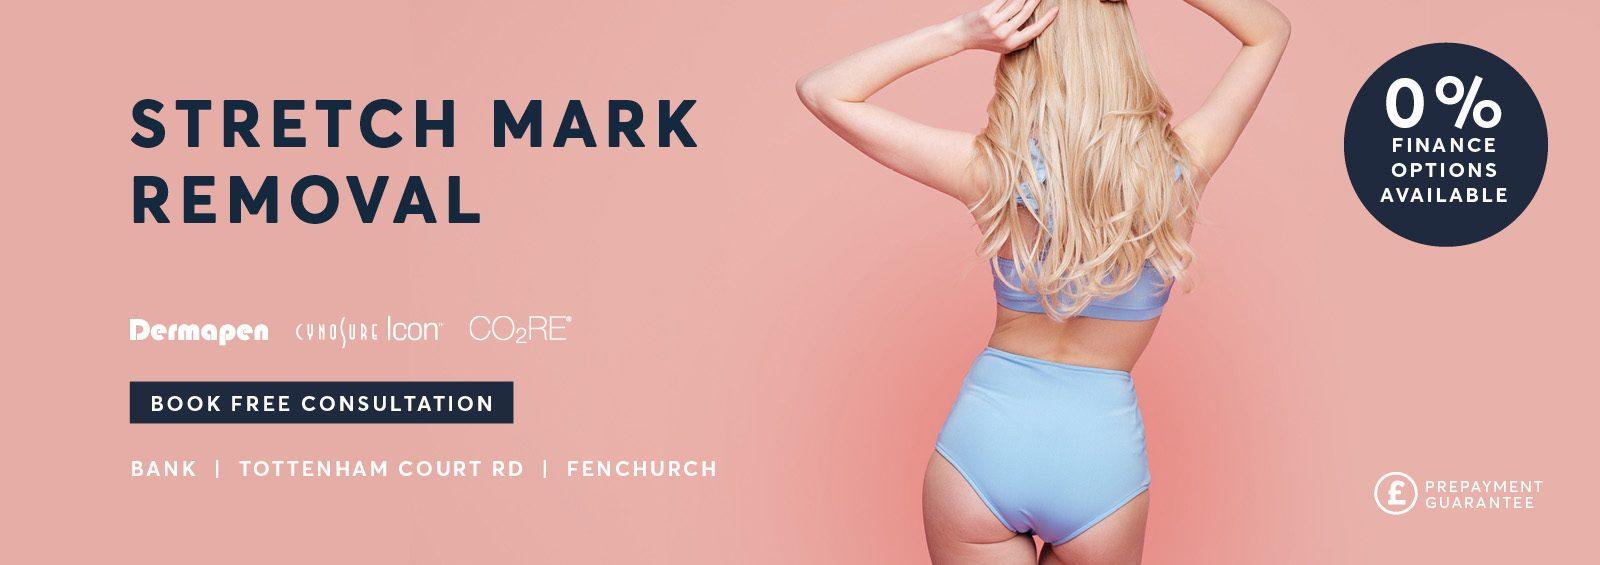 Stretch Mark treatment London